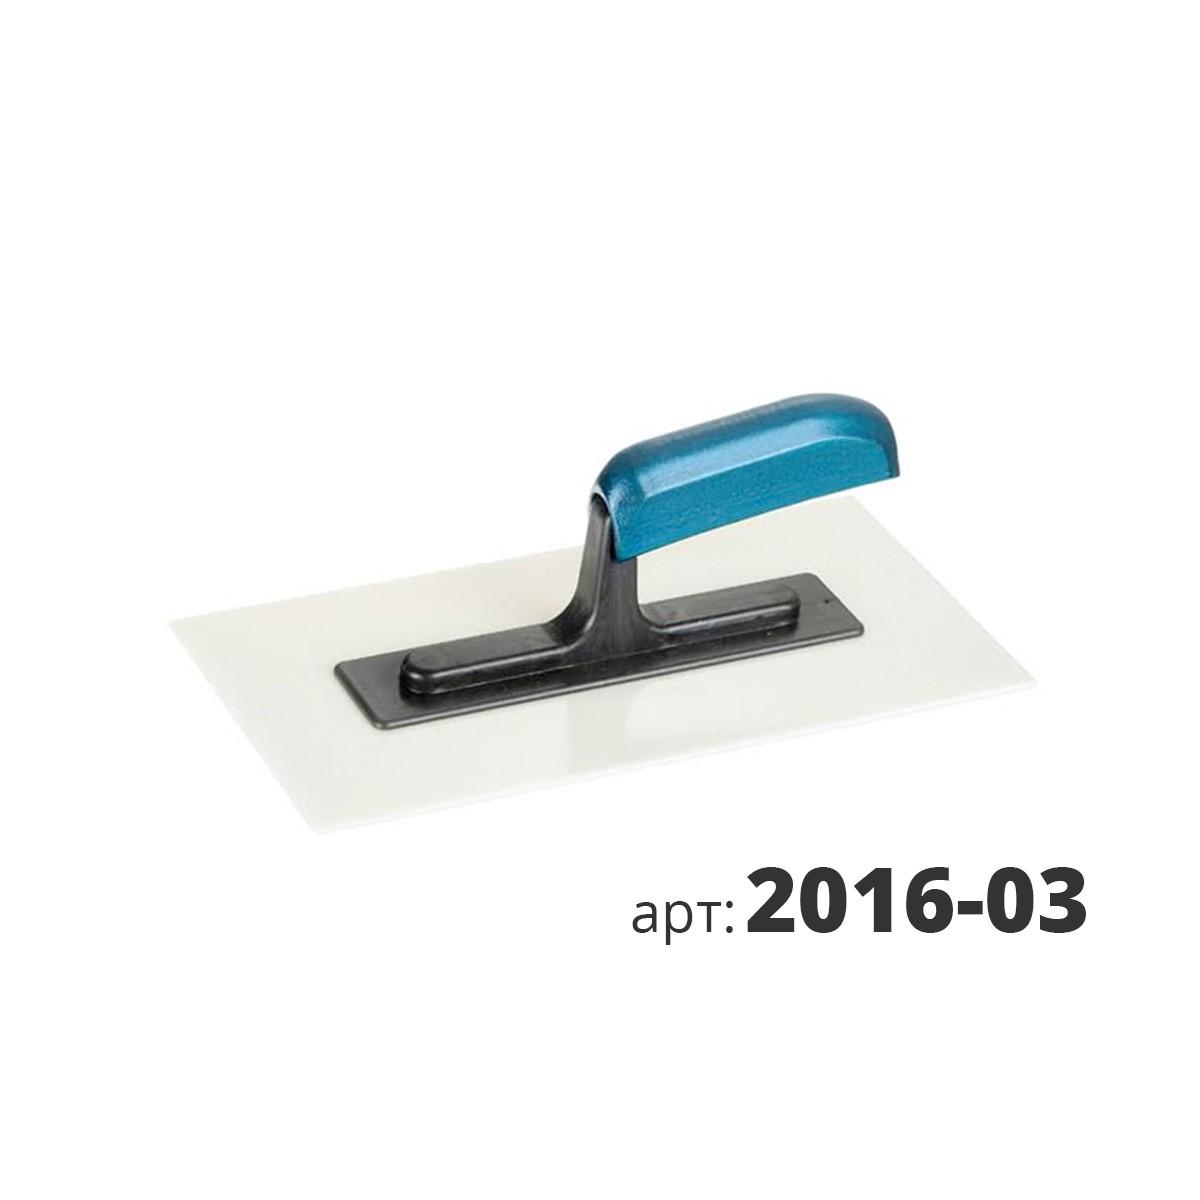 KUHLEN кельма ABS пластиковая 2016-03